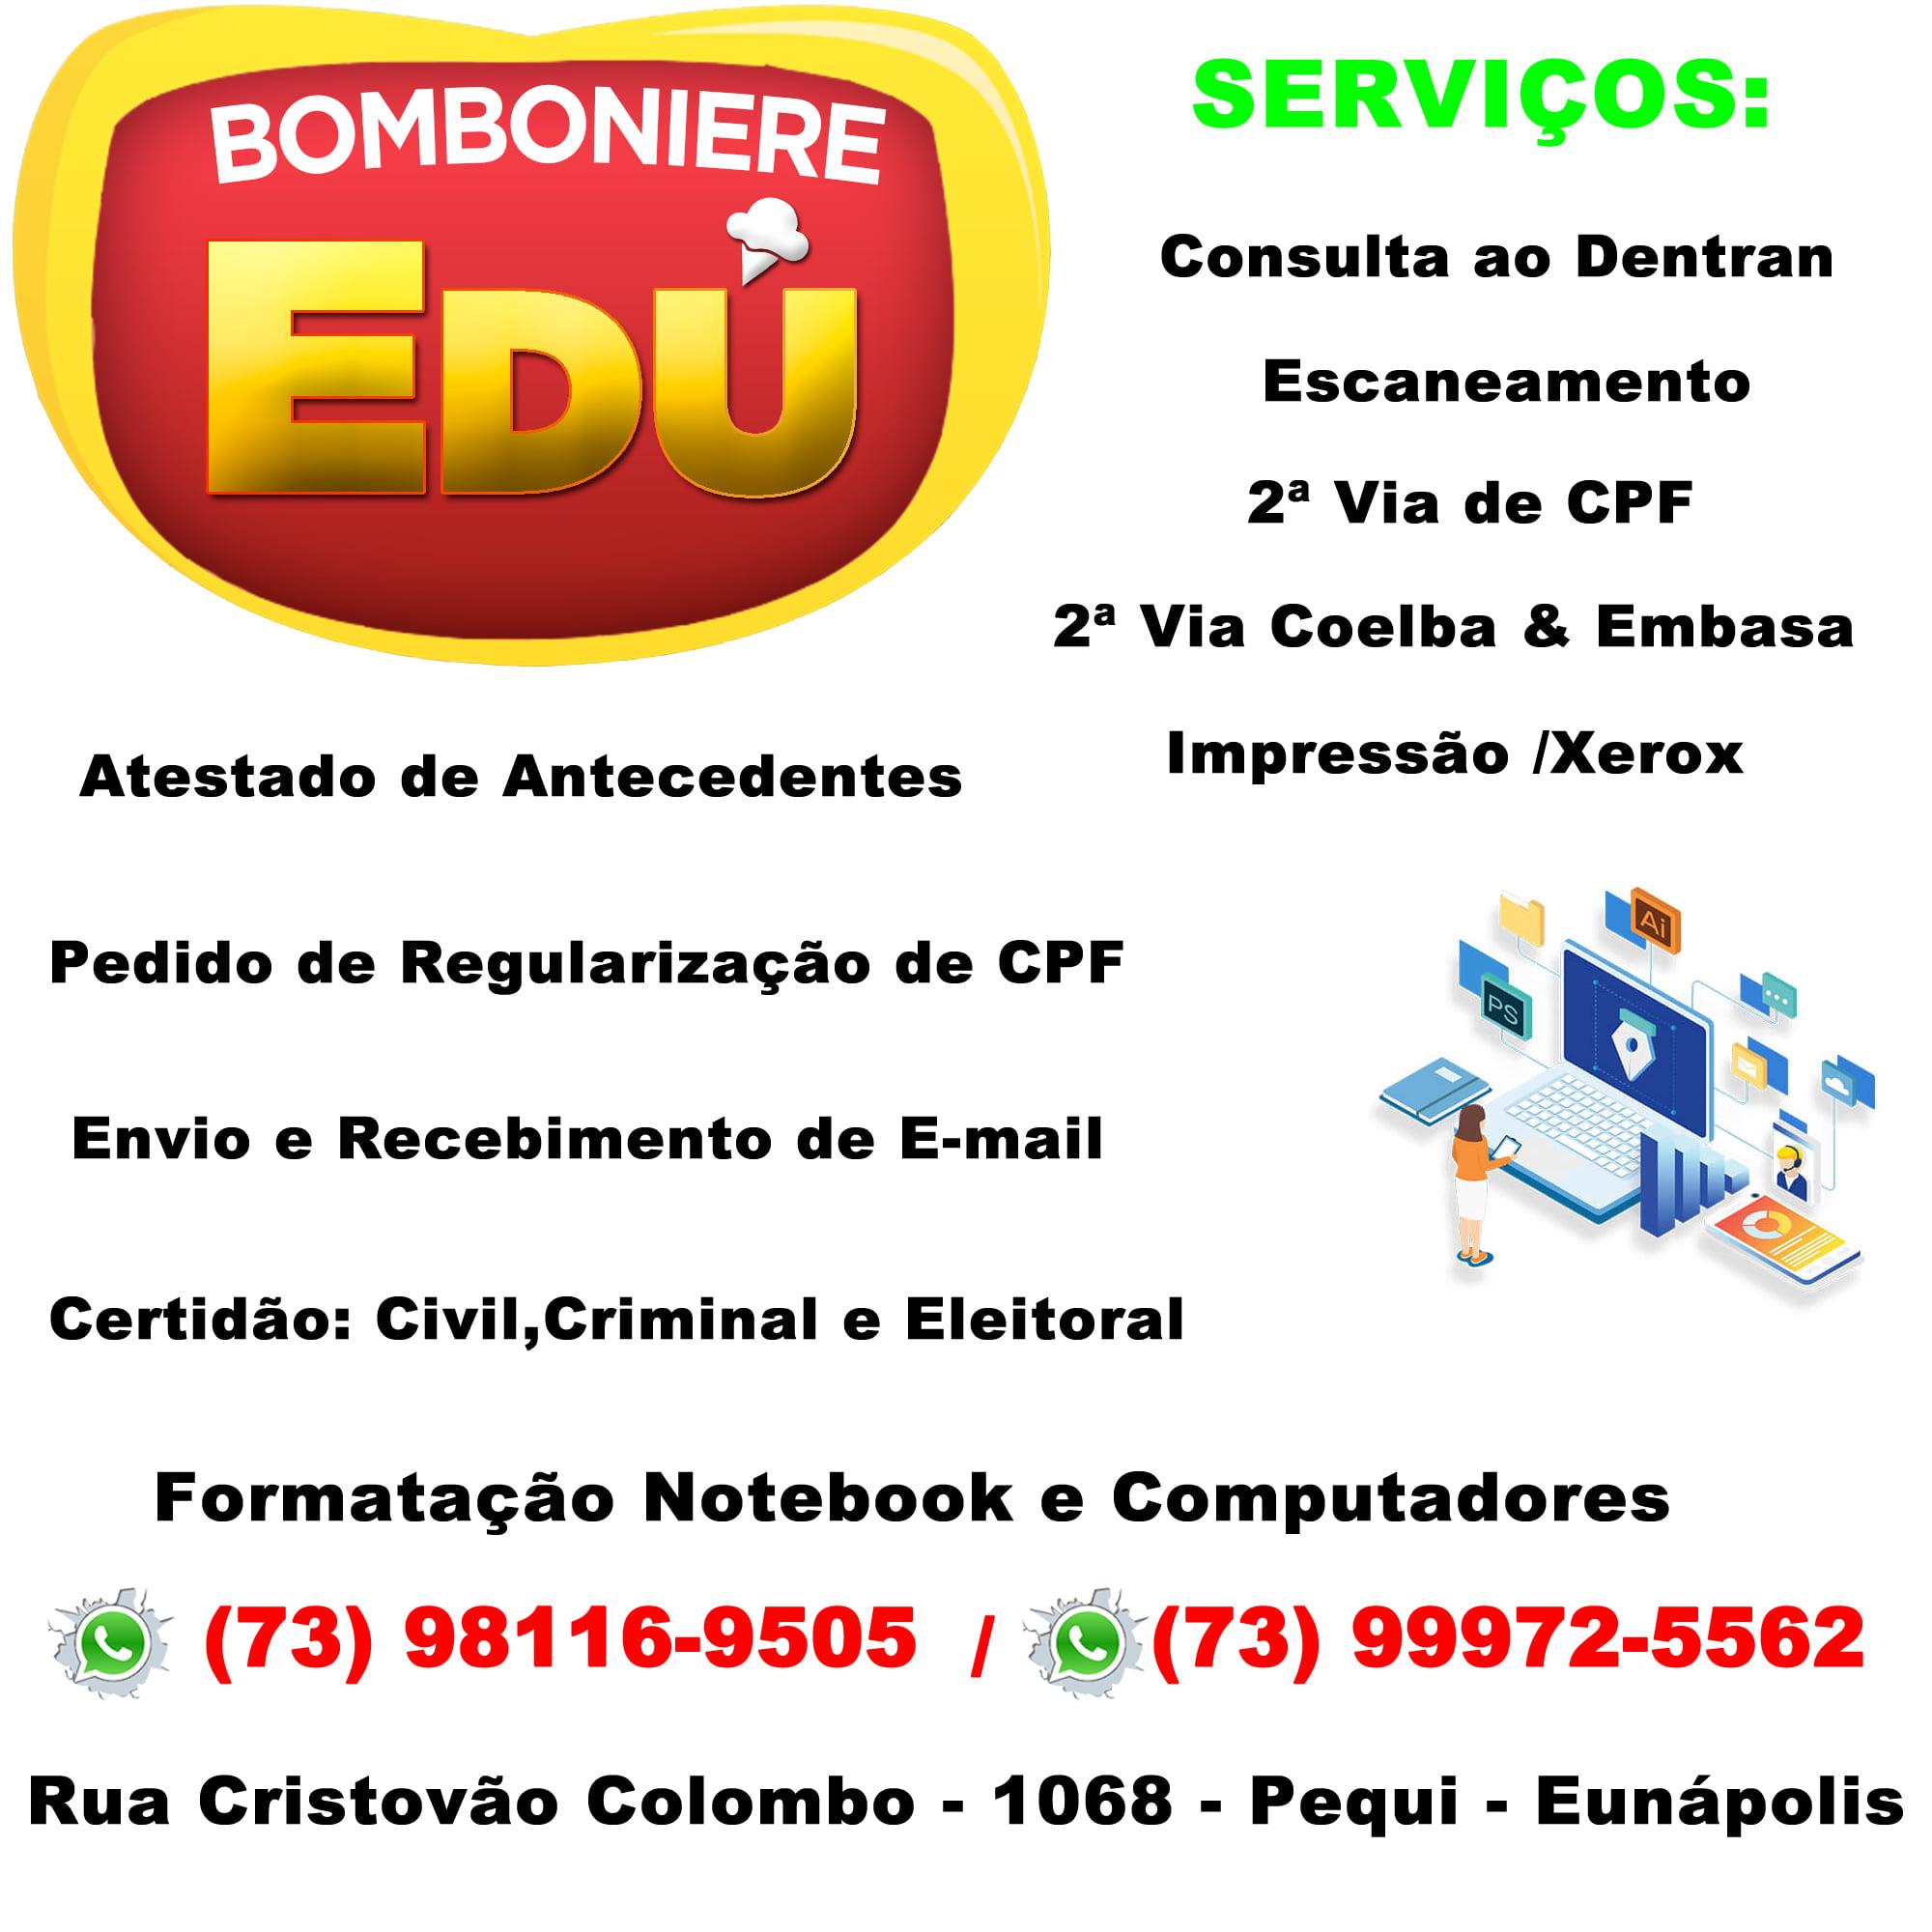 Prefeitura de Eunápolis inicia o recadastramento dos servidores a partir desta segunda, 1º 21